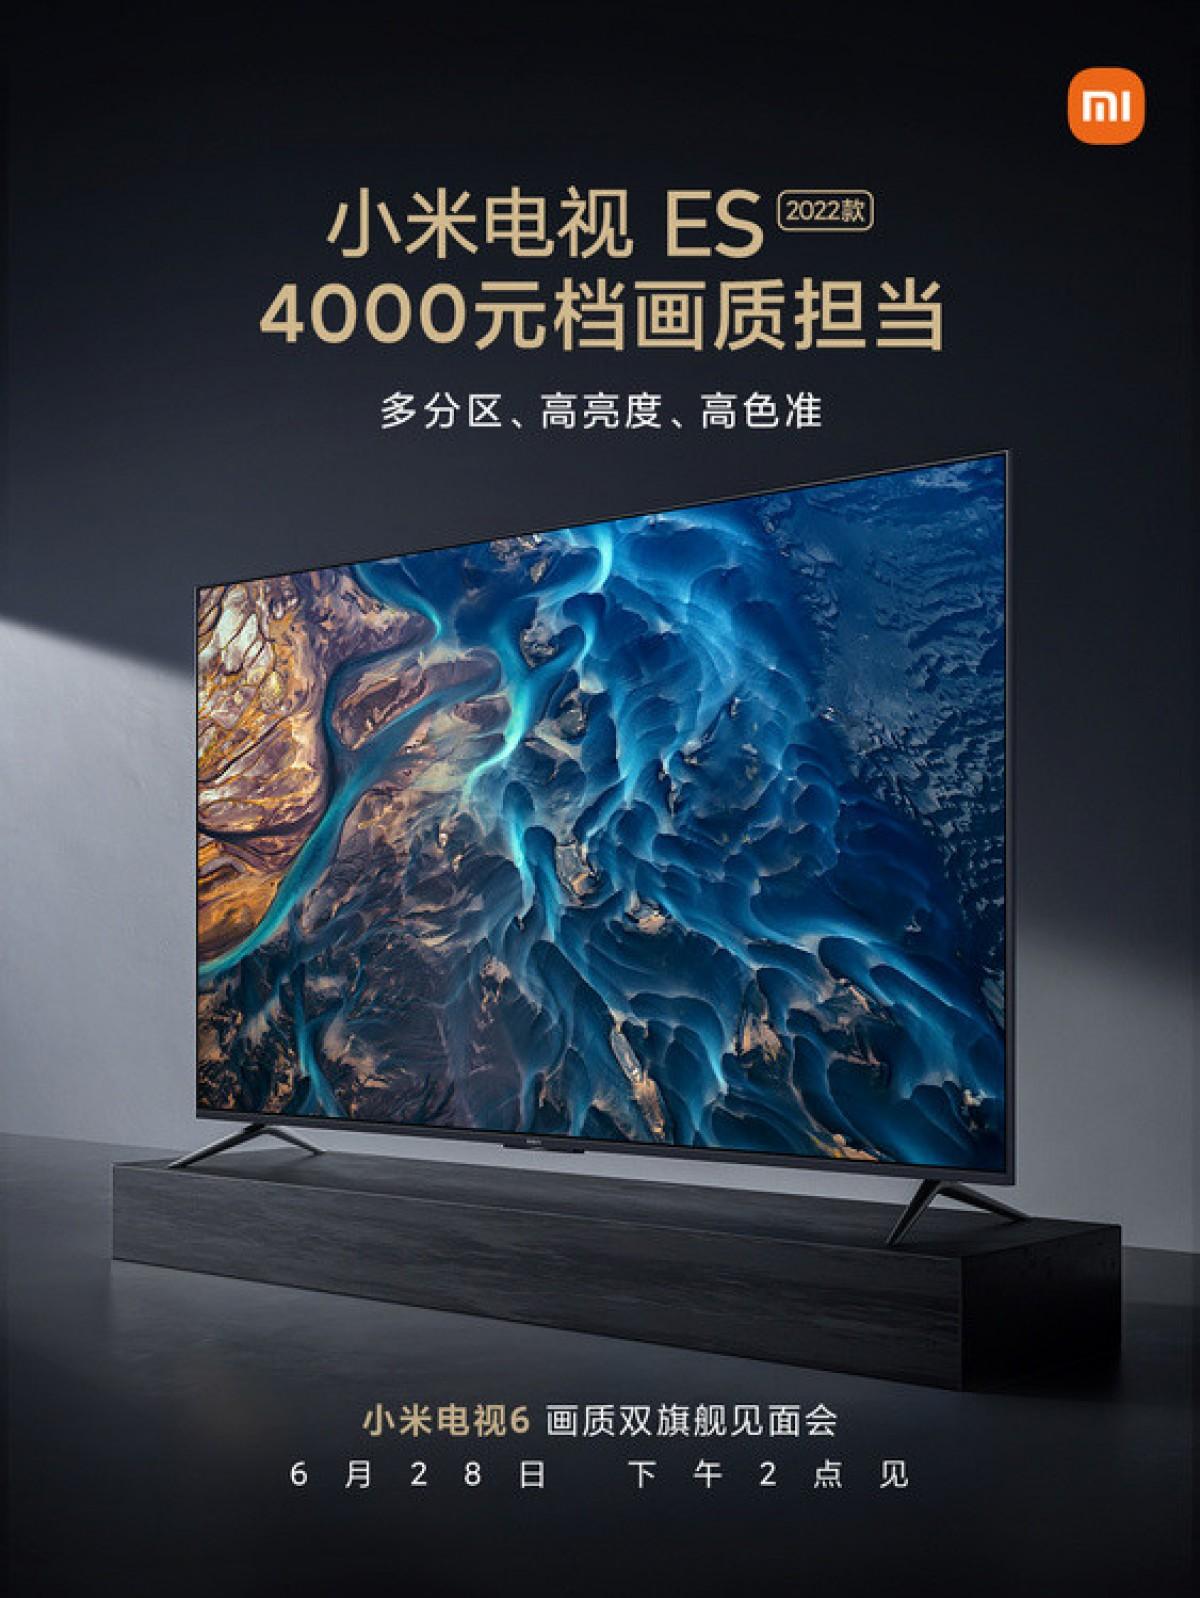 Xiaomi Mi TV ES 2022 Price and Specs Revealed in Teaser